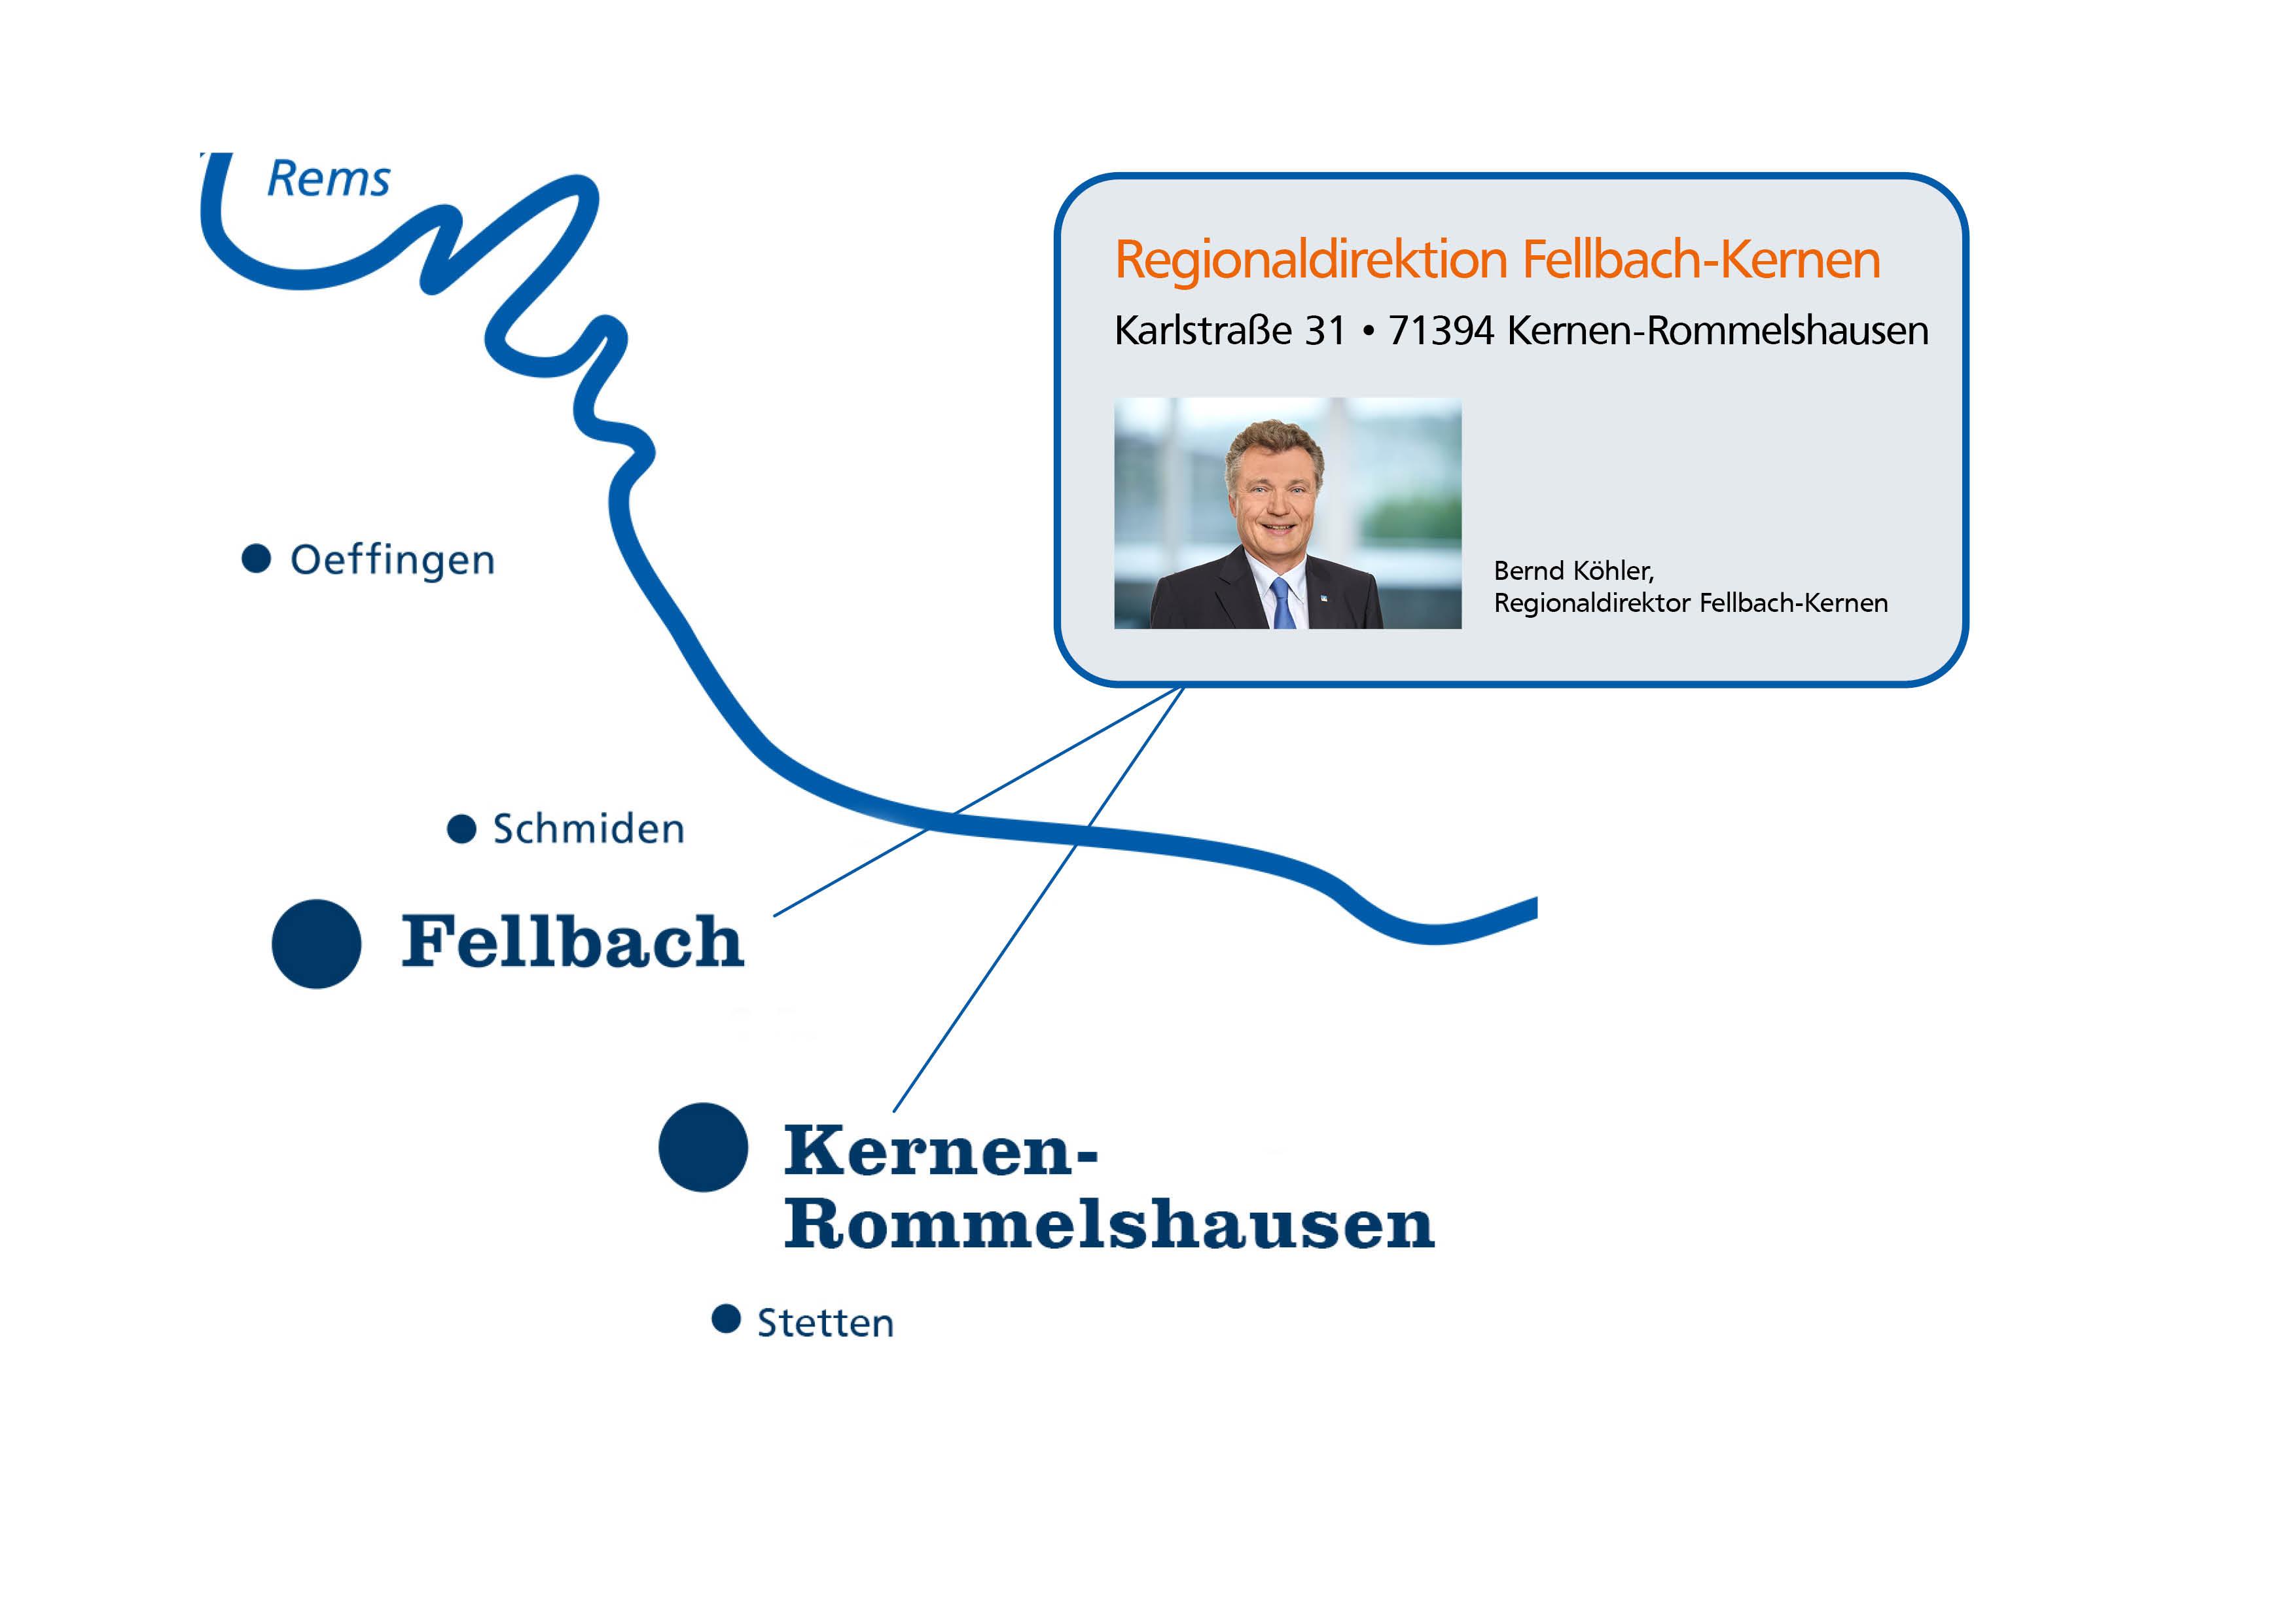 Regionaldirektion Fellbach-Kernen